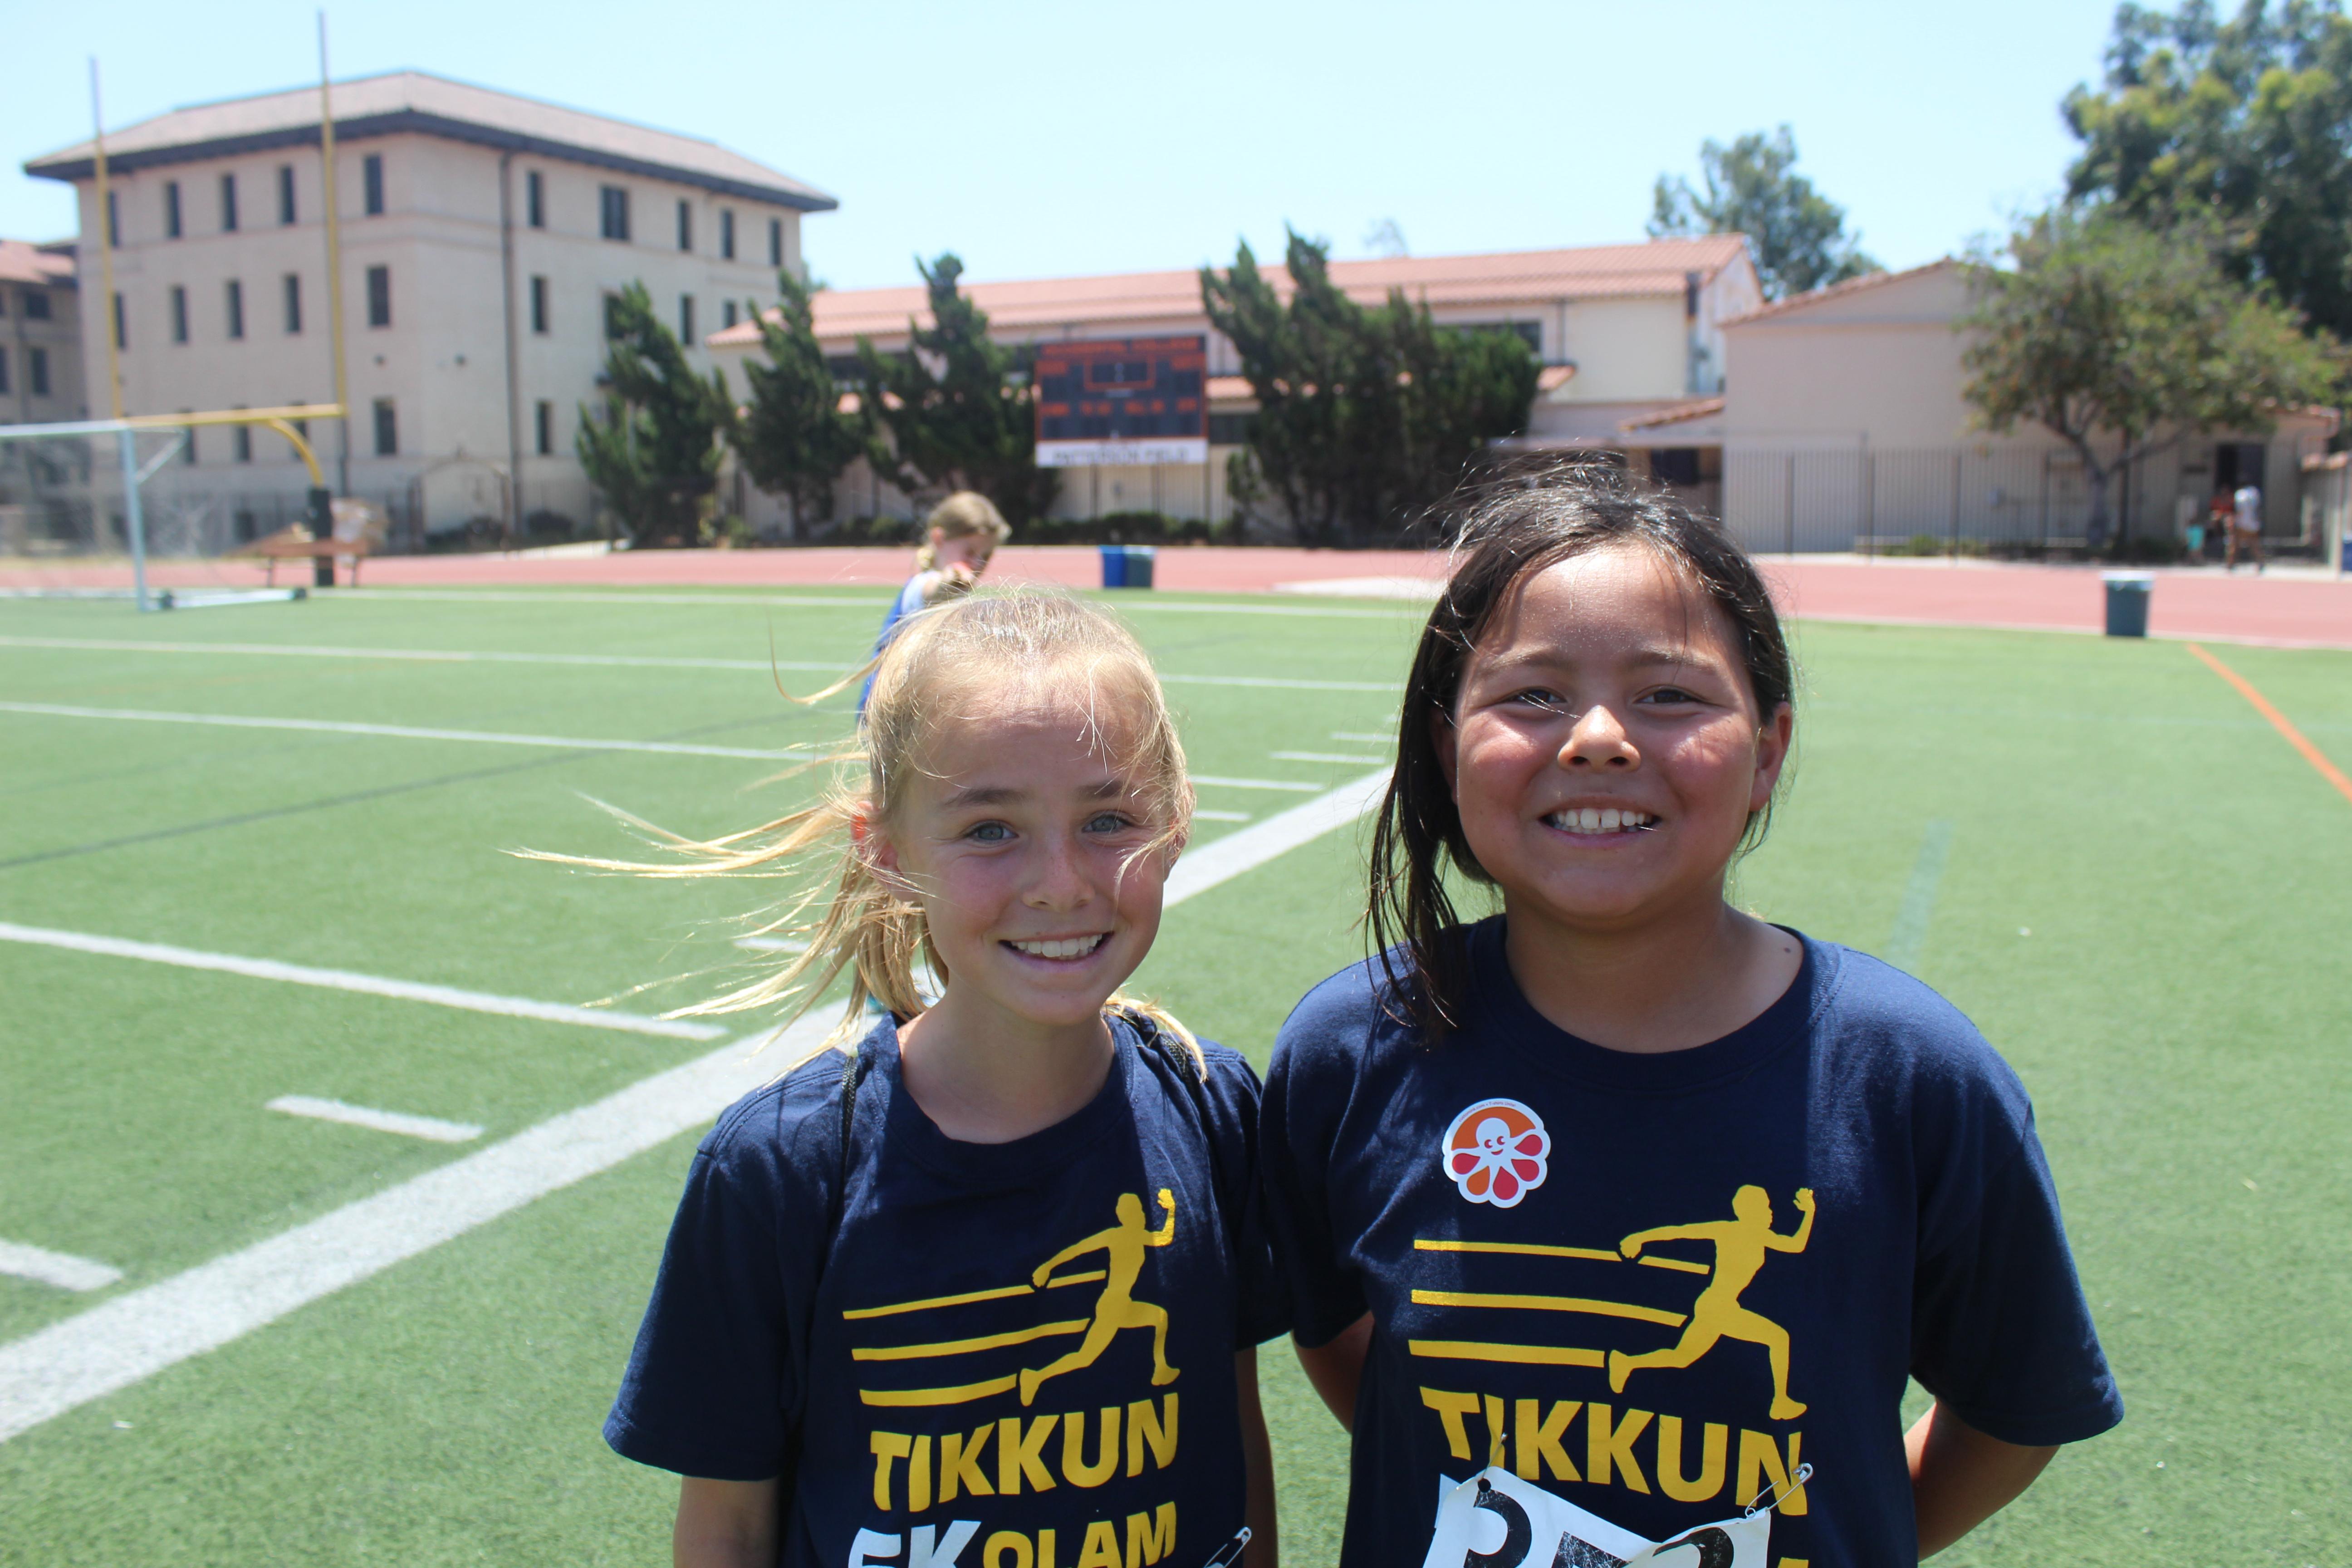 Summer Program - Volleyball | URJ 6 Points Sports Academy - California